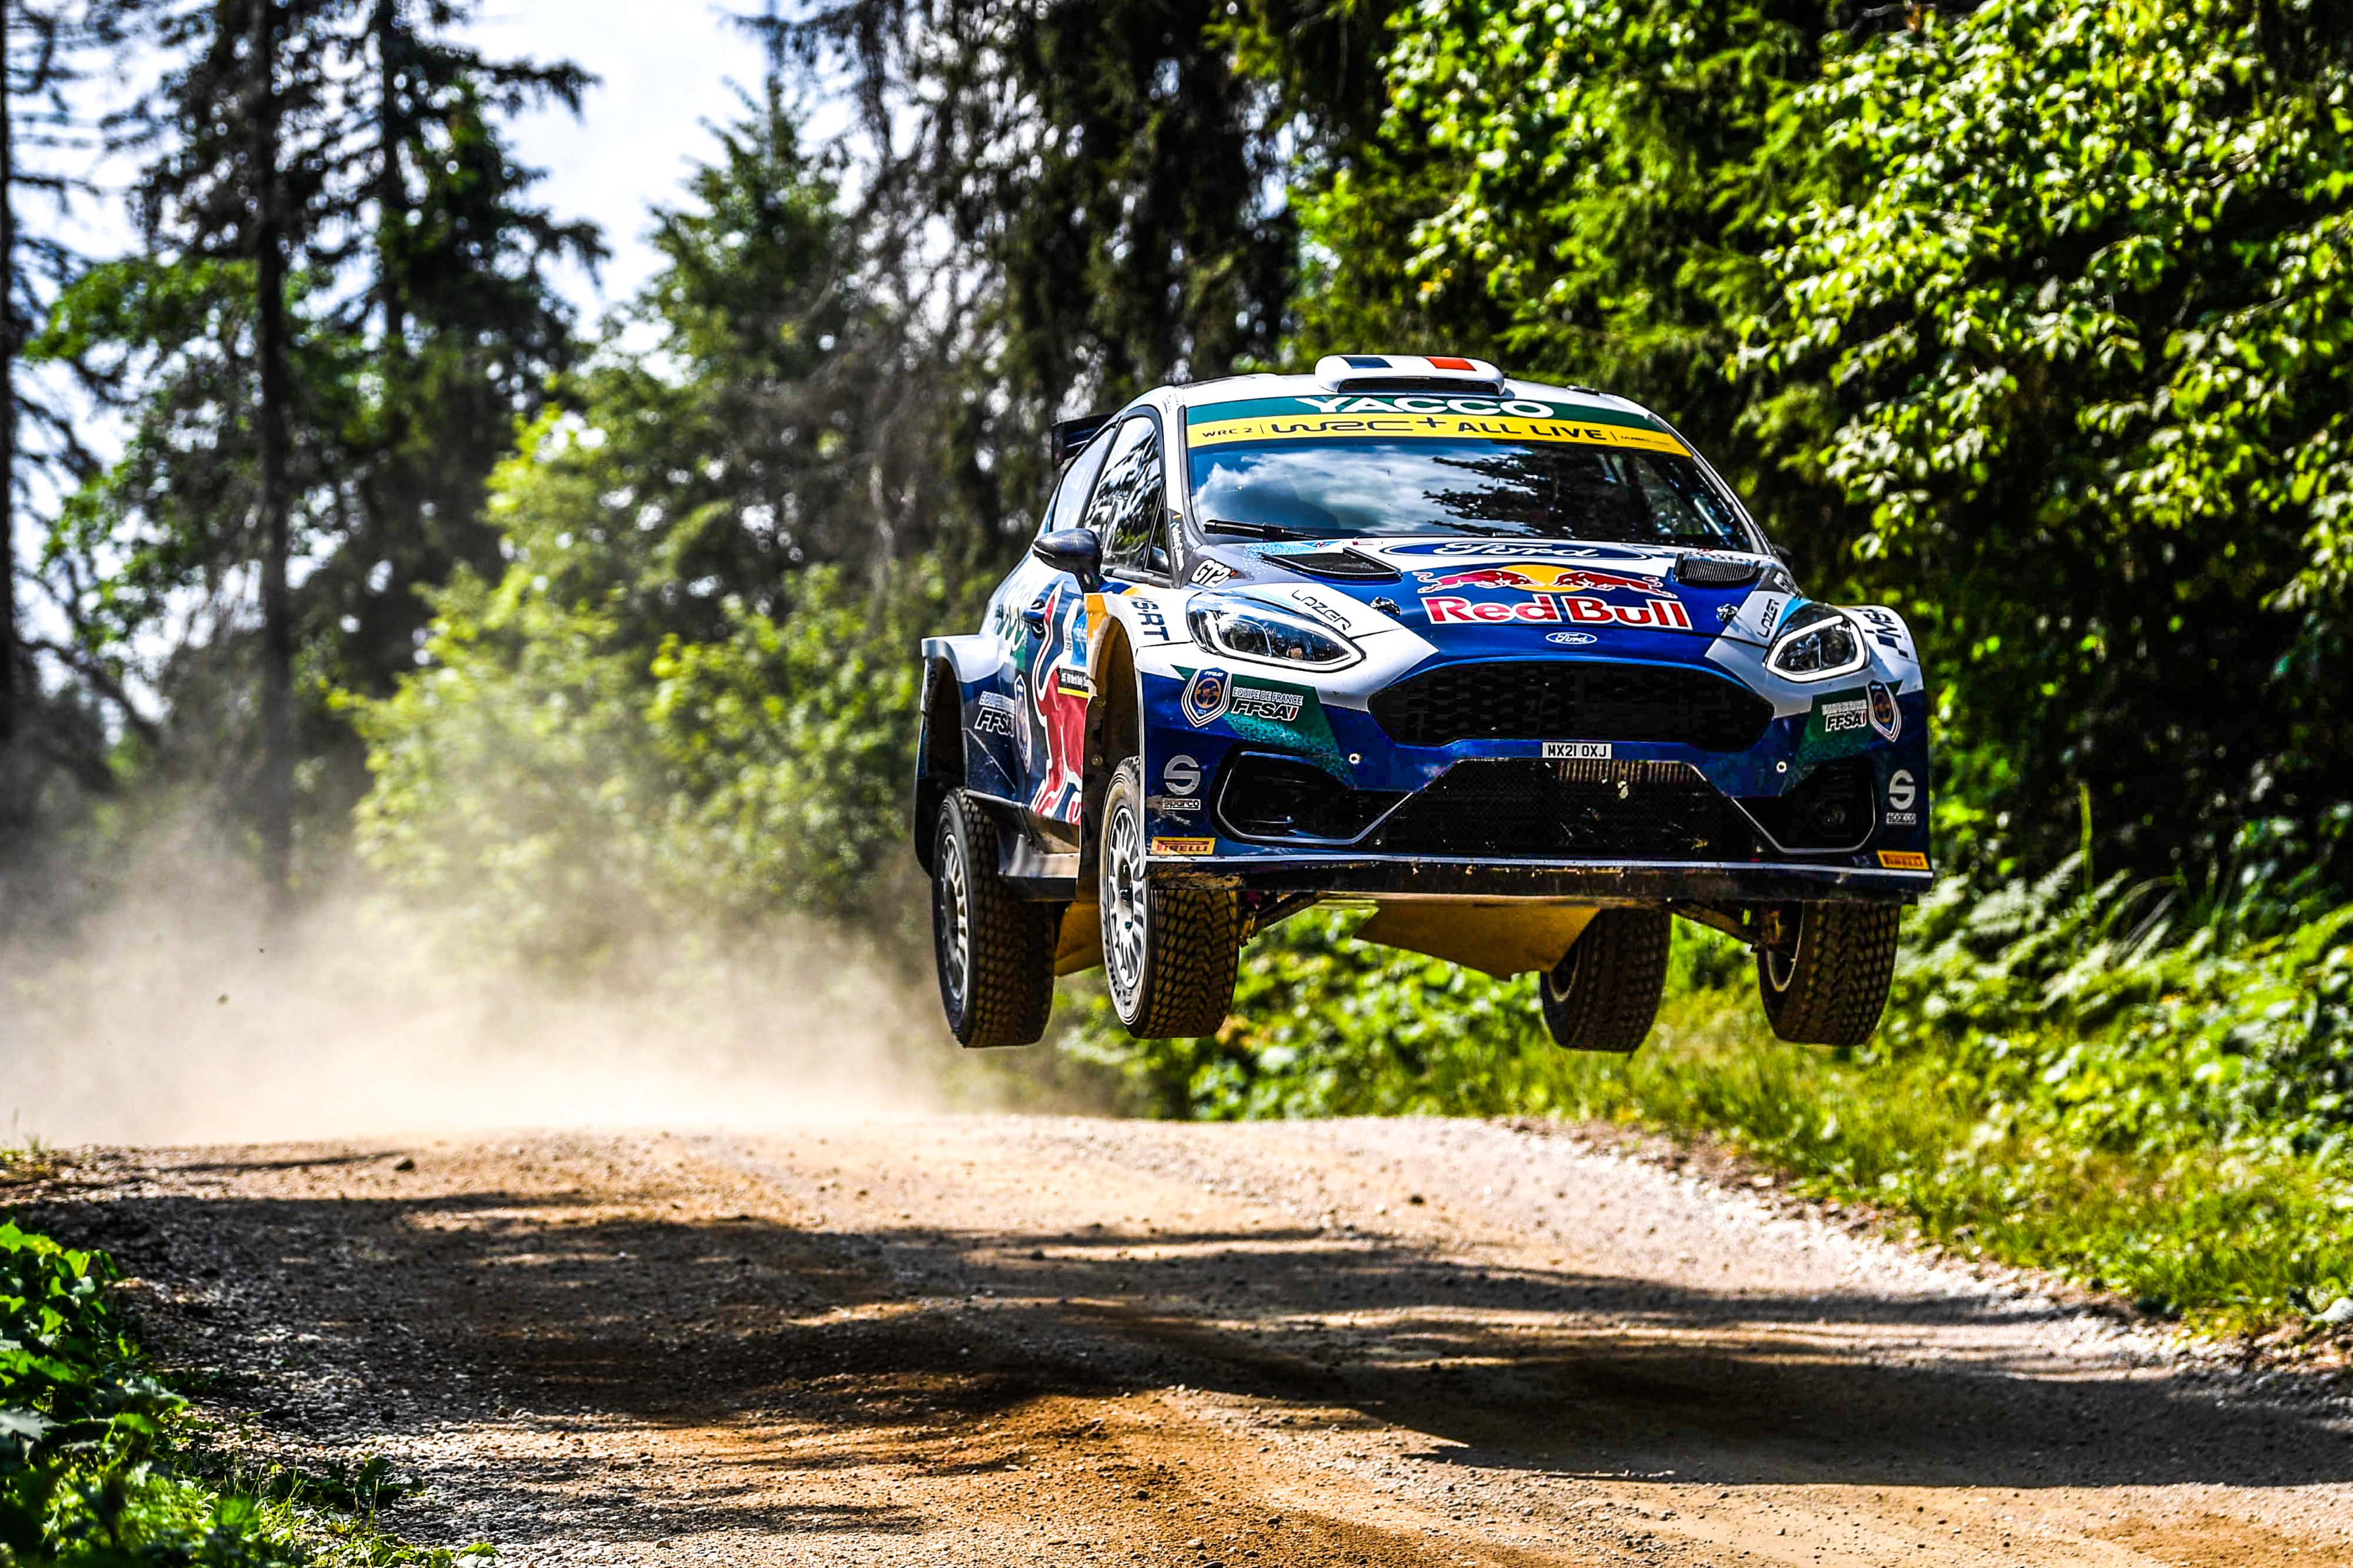 WRC: 11º Rally Estonia [15-18 Julio] - Página 3 E6a-YnSWUAw9J1K?format=jpg&name=4096x4096